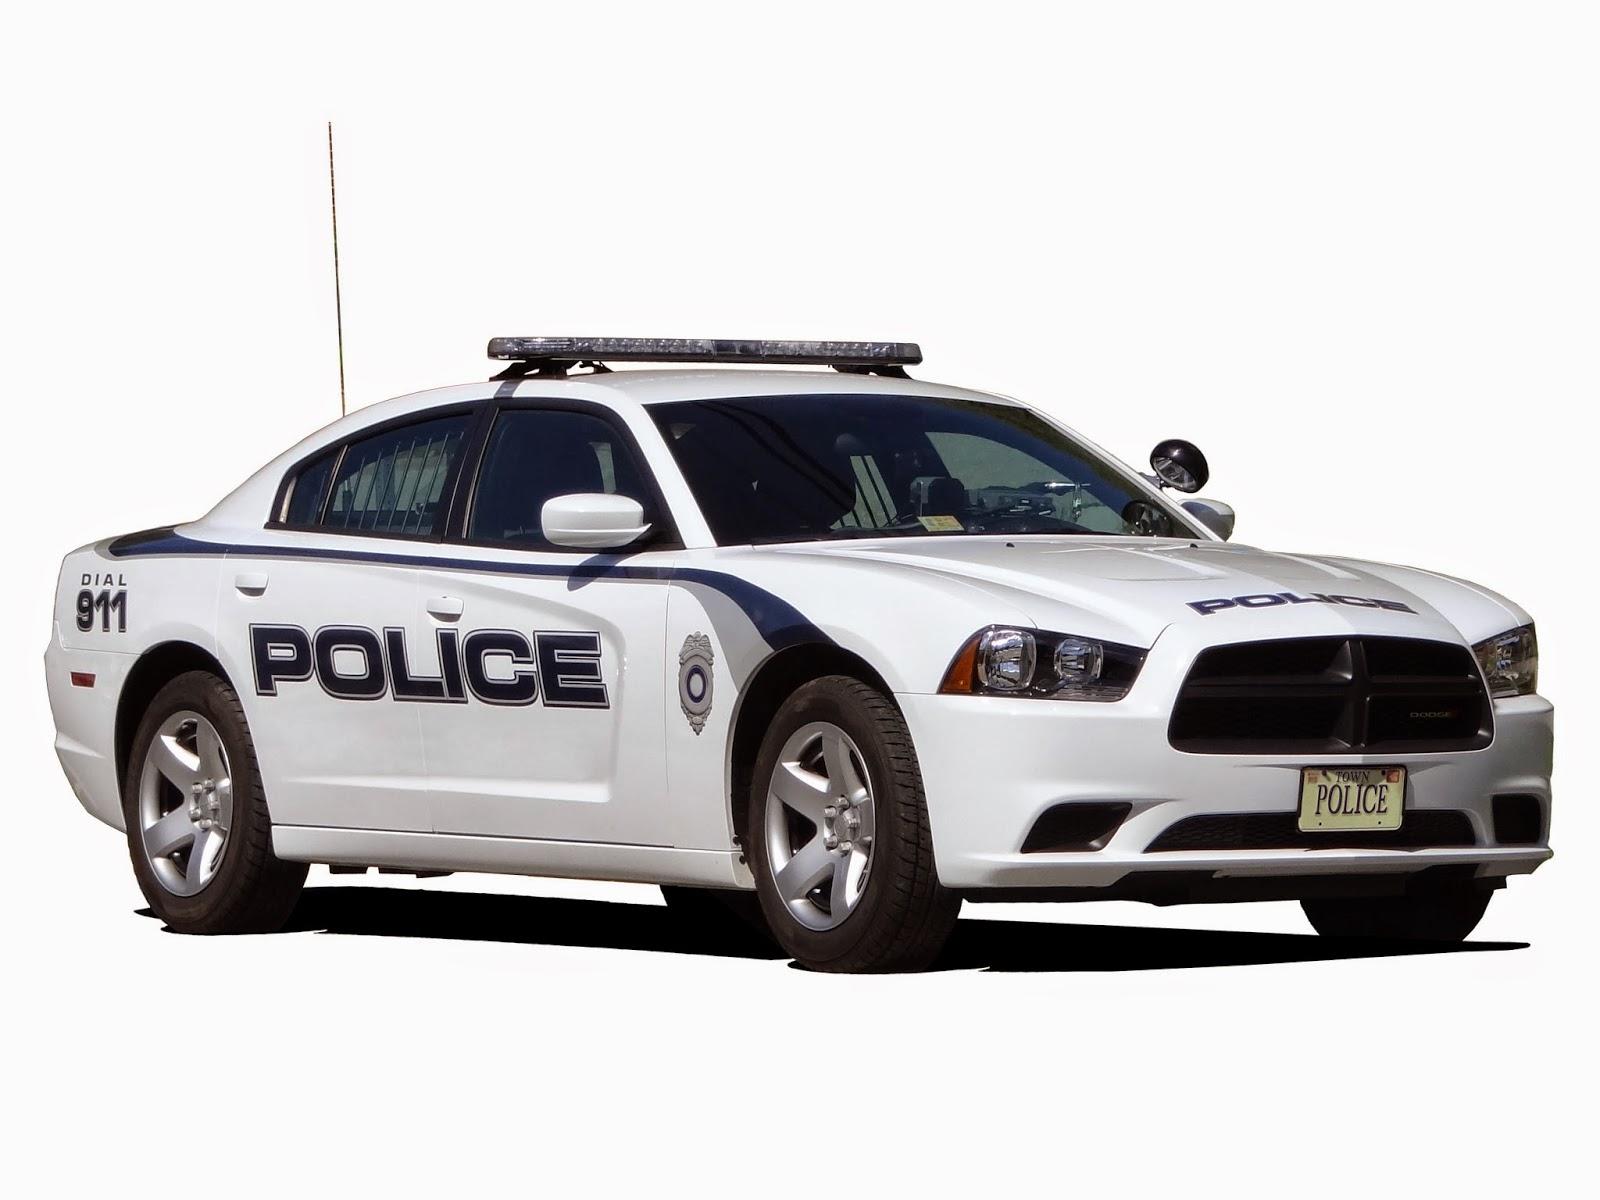 La policía de Dubai usa super autos